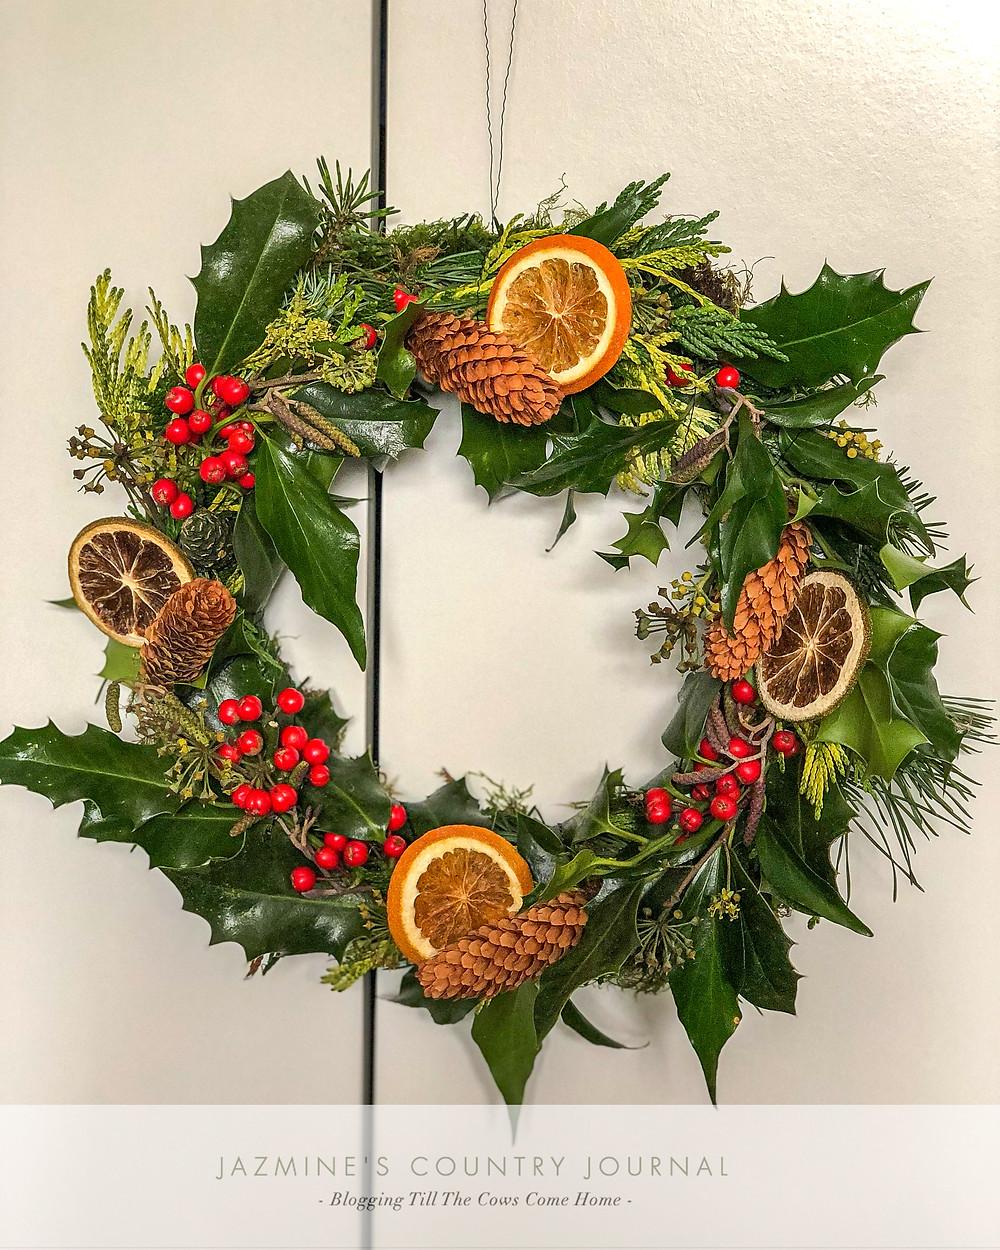 Final image of wreath